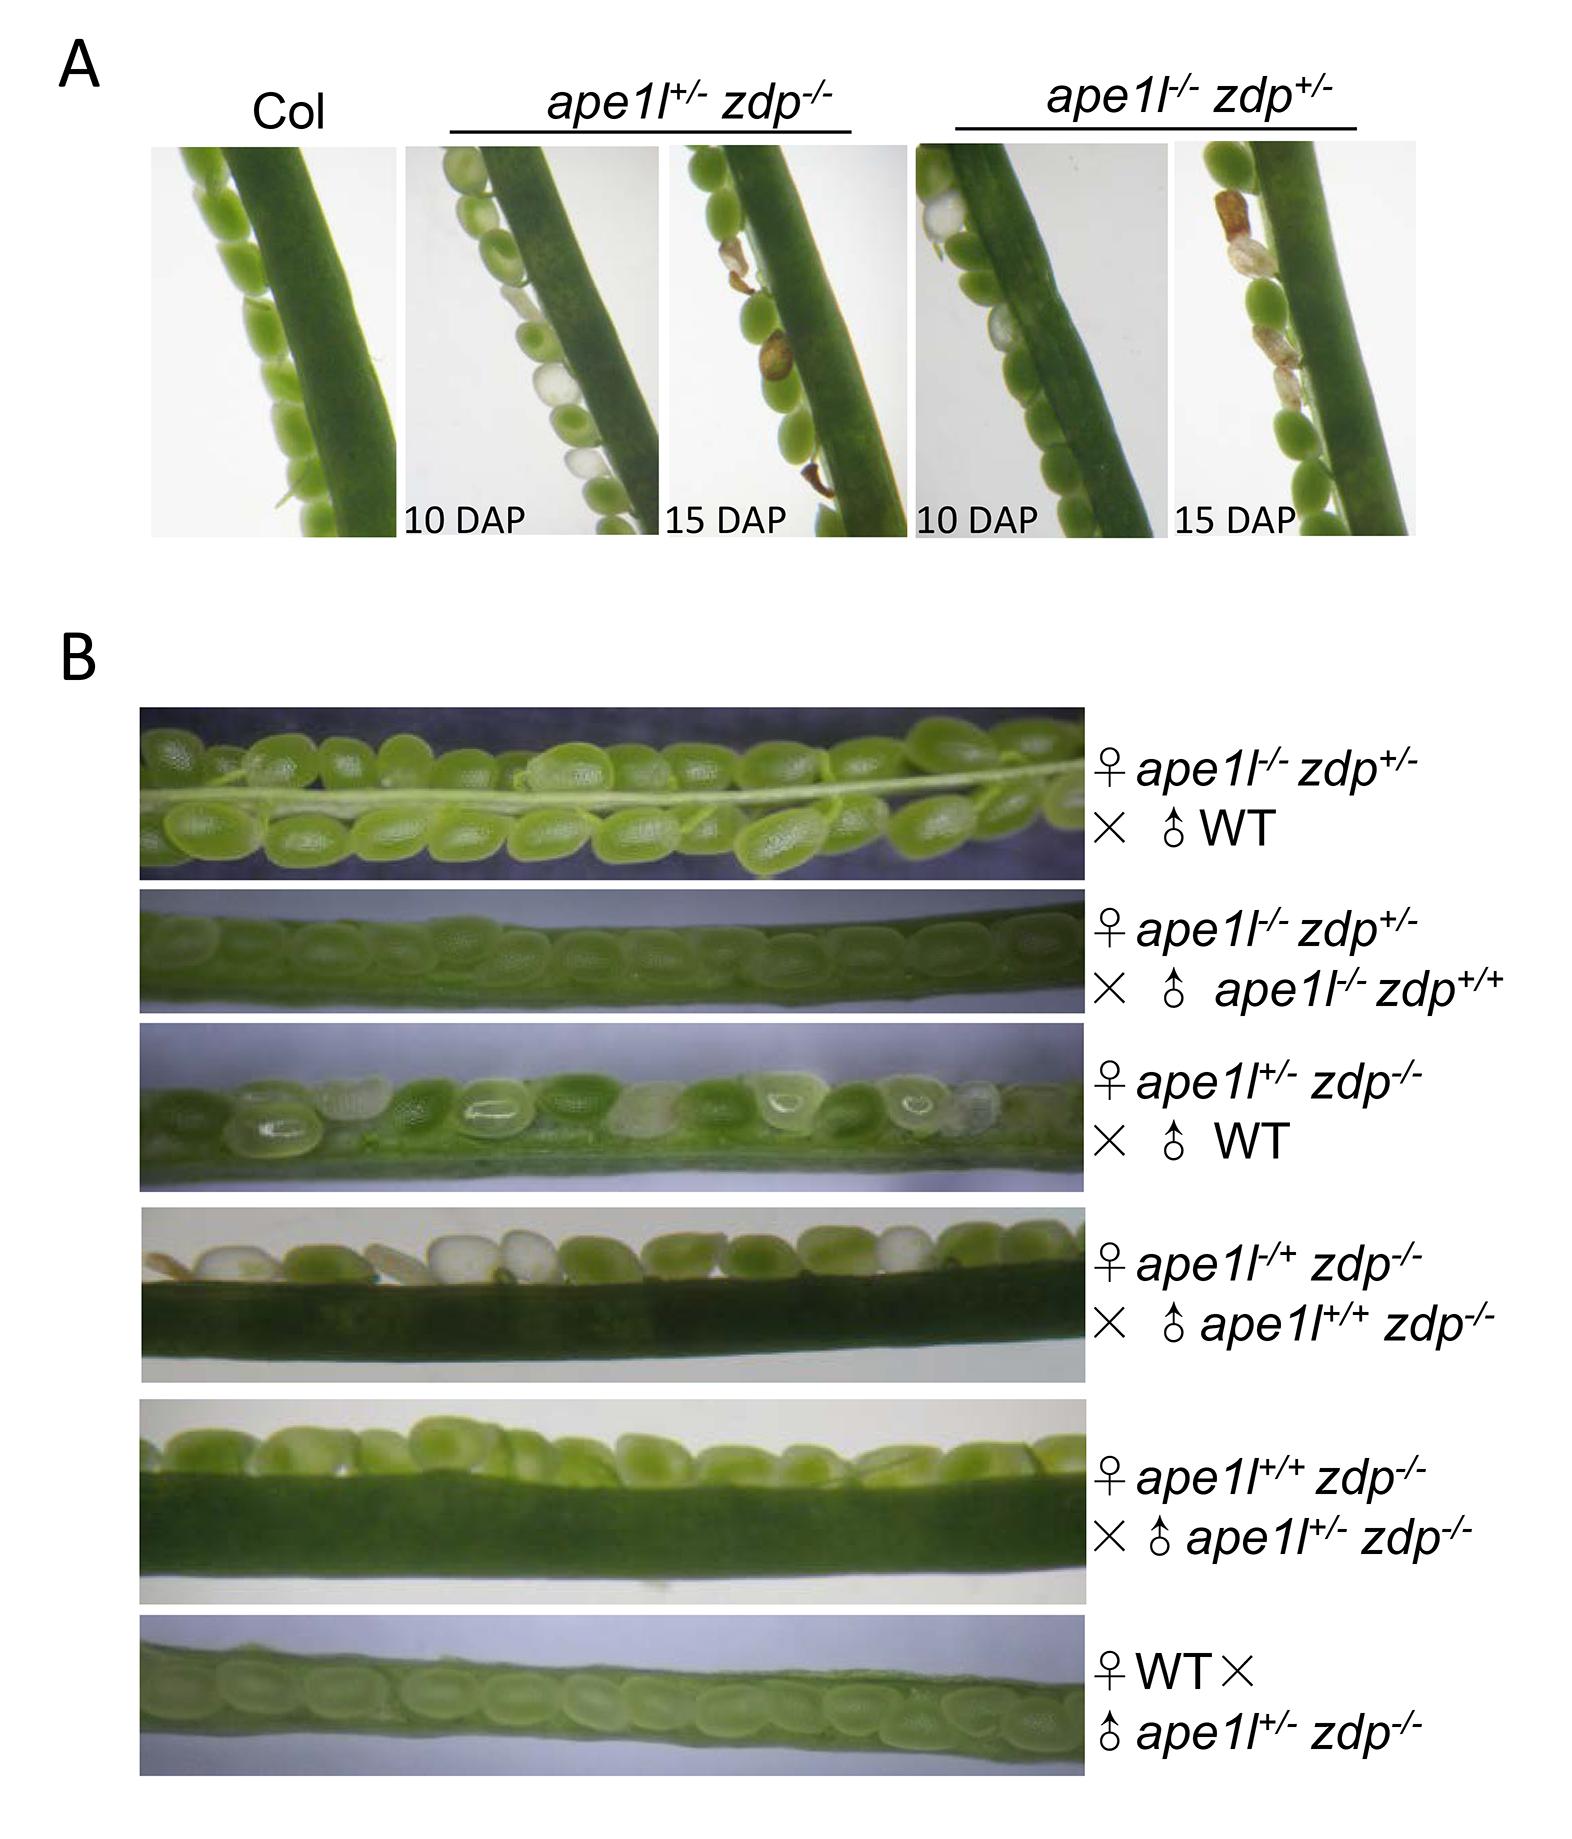 Effects of <i>ape1l</i> and <i>zdp</i> double mutations on seed development.